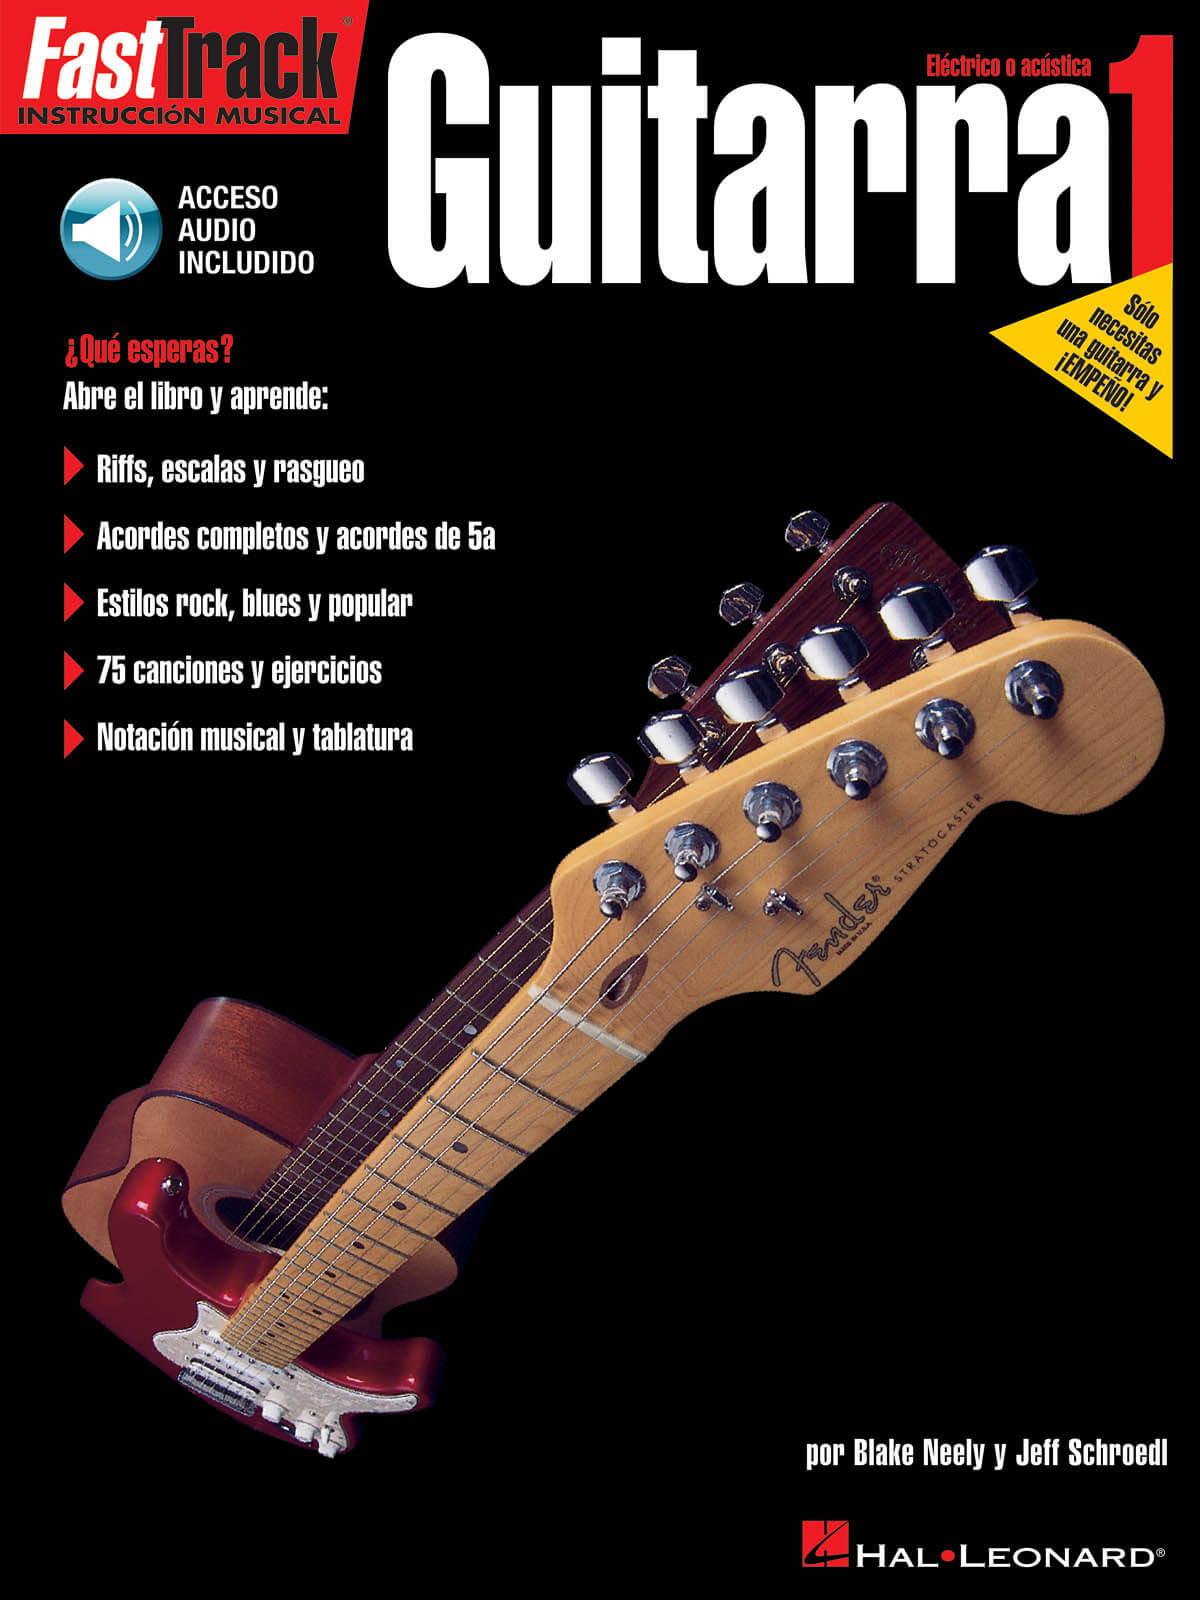 FastTrack - Guitarra 1 (ESP)